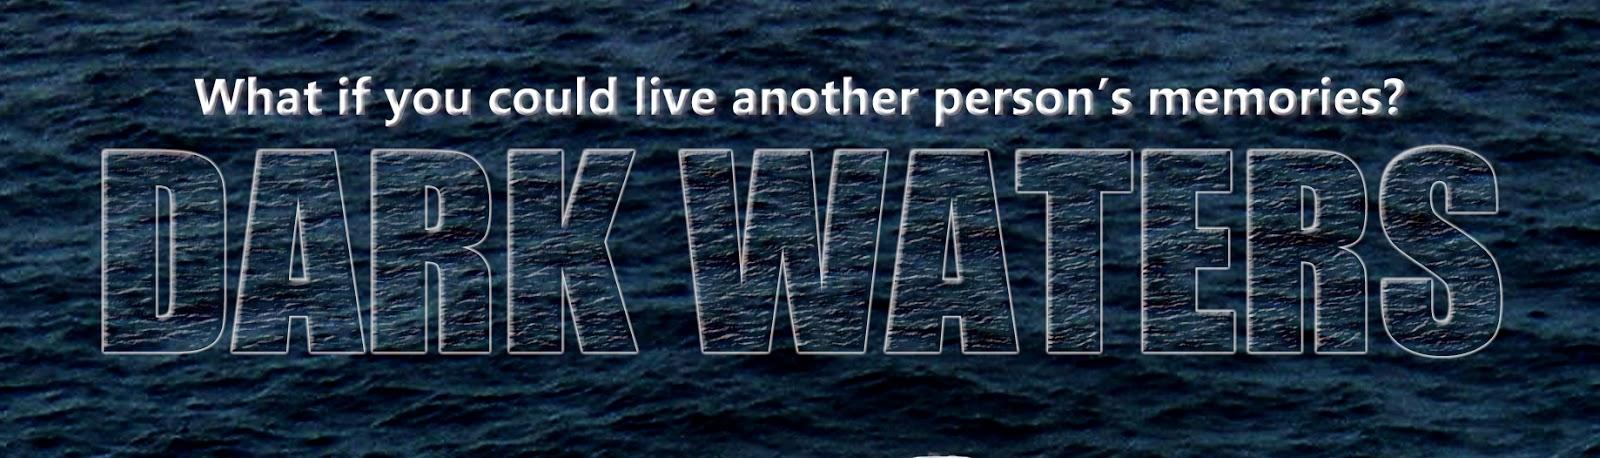 http://www.gjowensbooks.com/p/dark-waters-excerpt.html